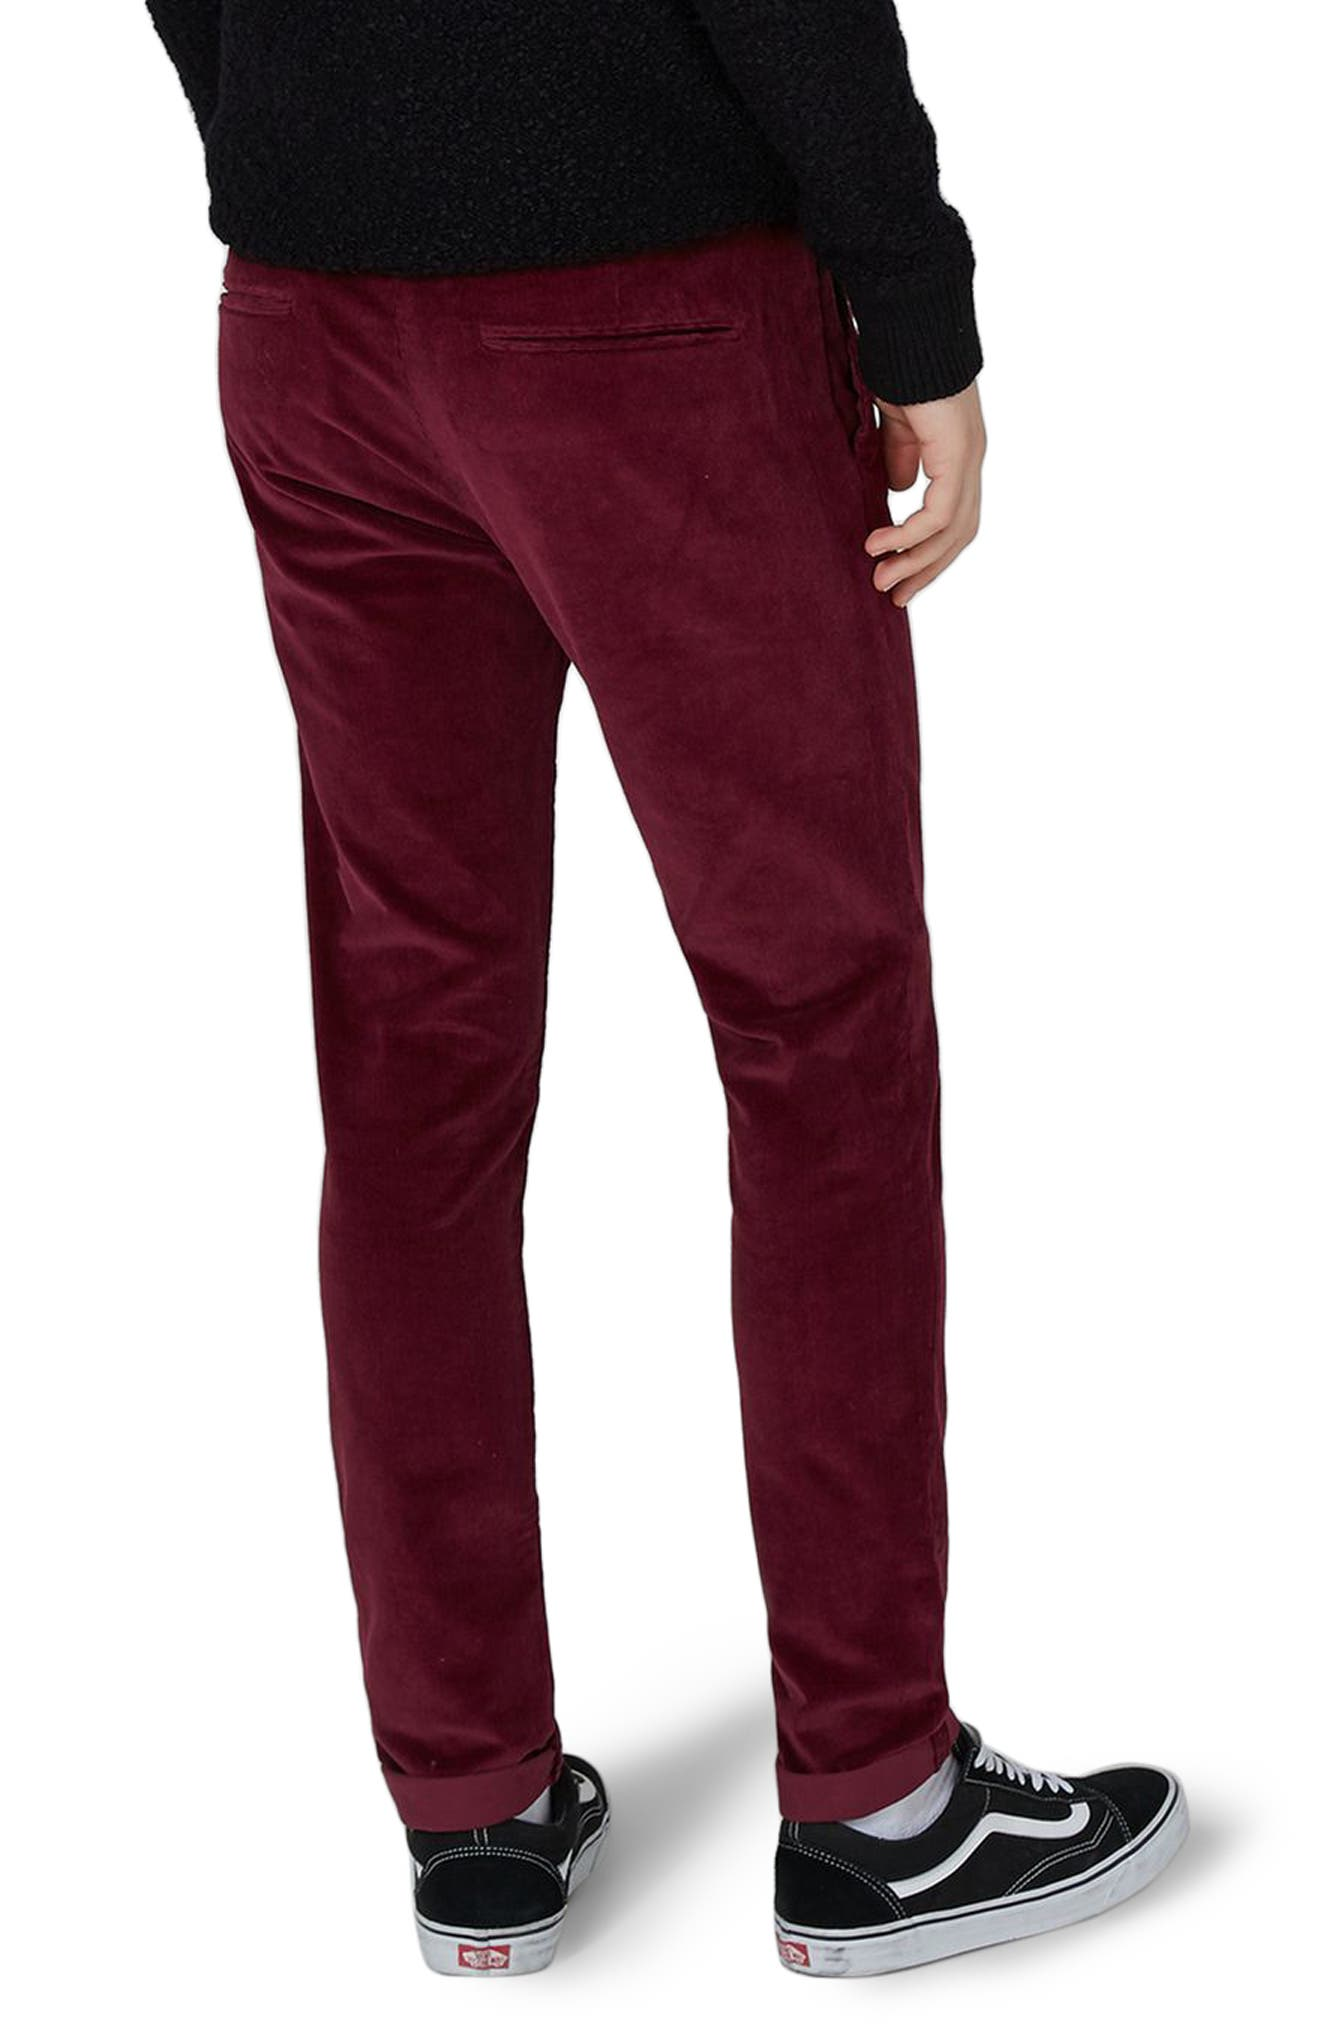 Skinny Fit Corduroy Trousers,                             Alternate thumbnail 2, color,                             Burgundy